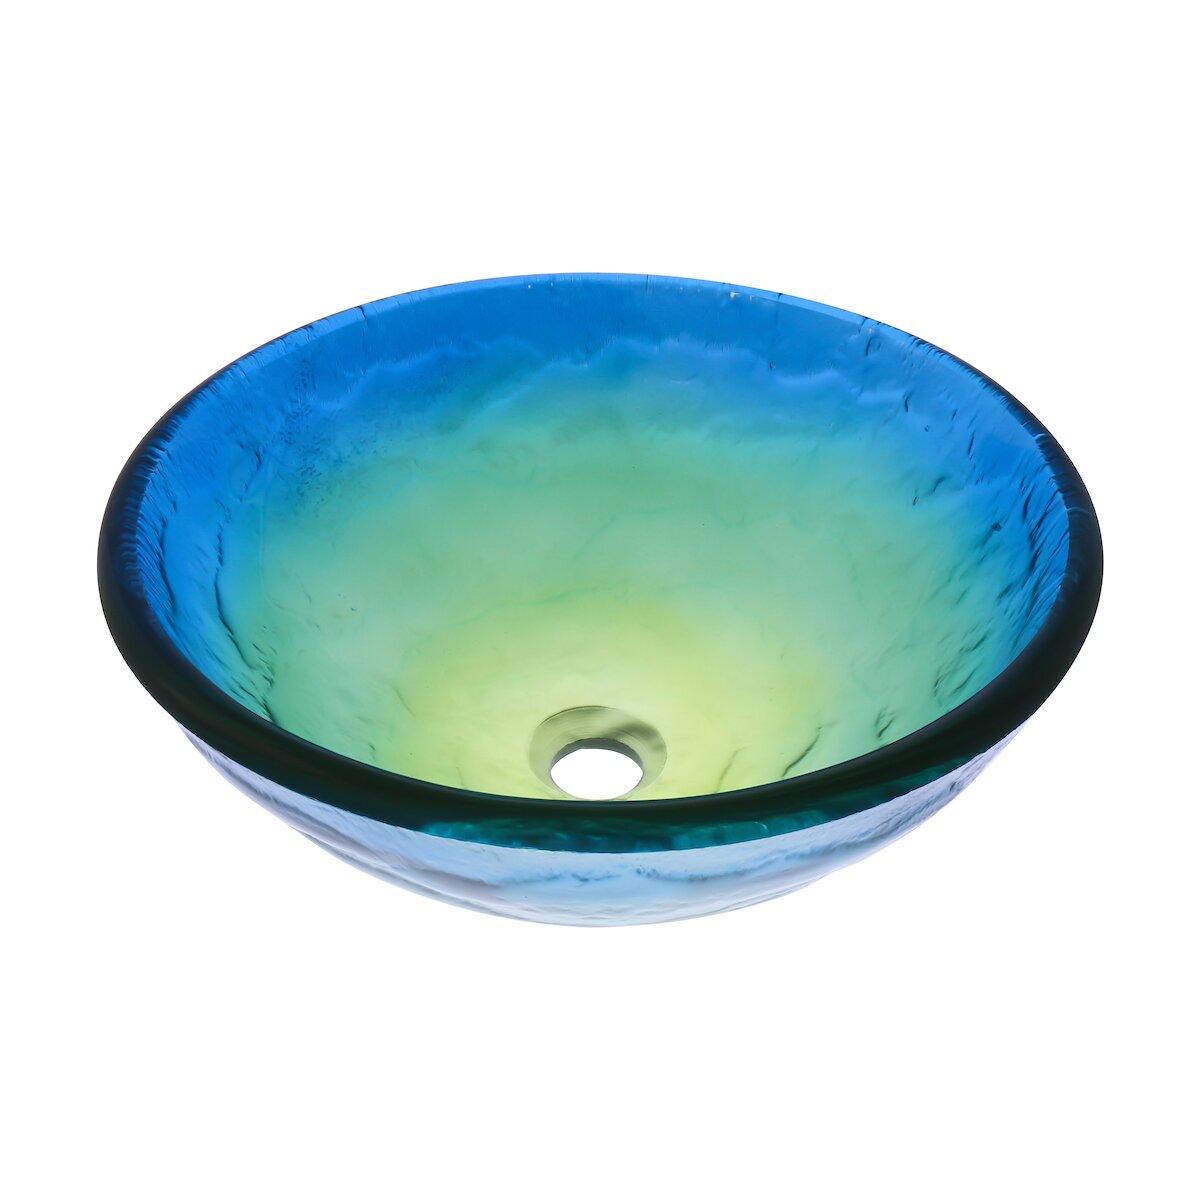 Novatto mare glass vessel bathroom sink set wayfair for Bath toilet and sink sets